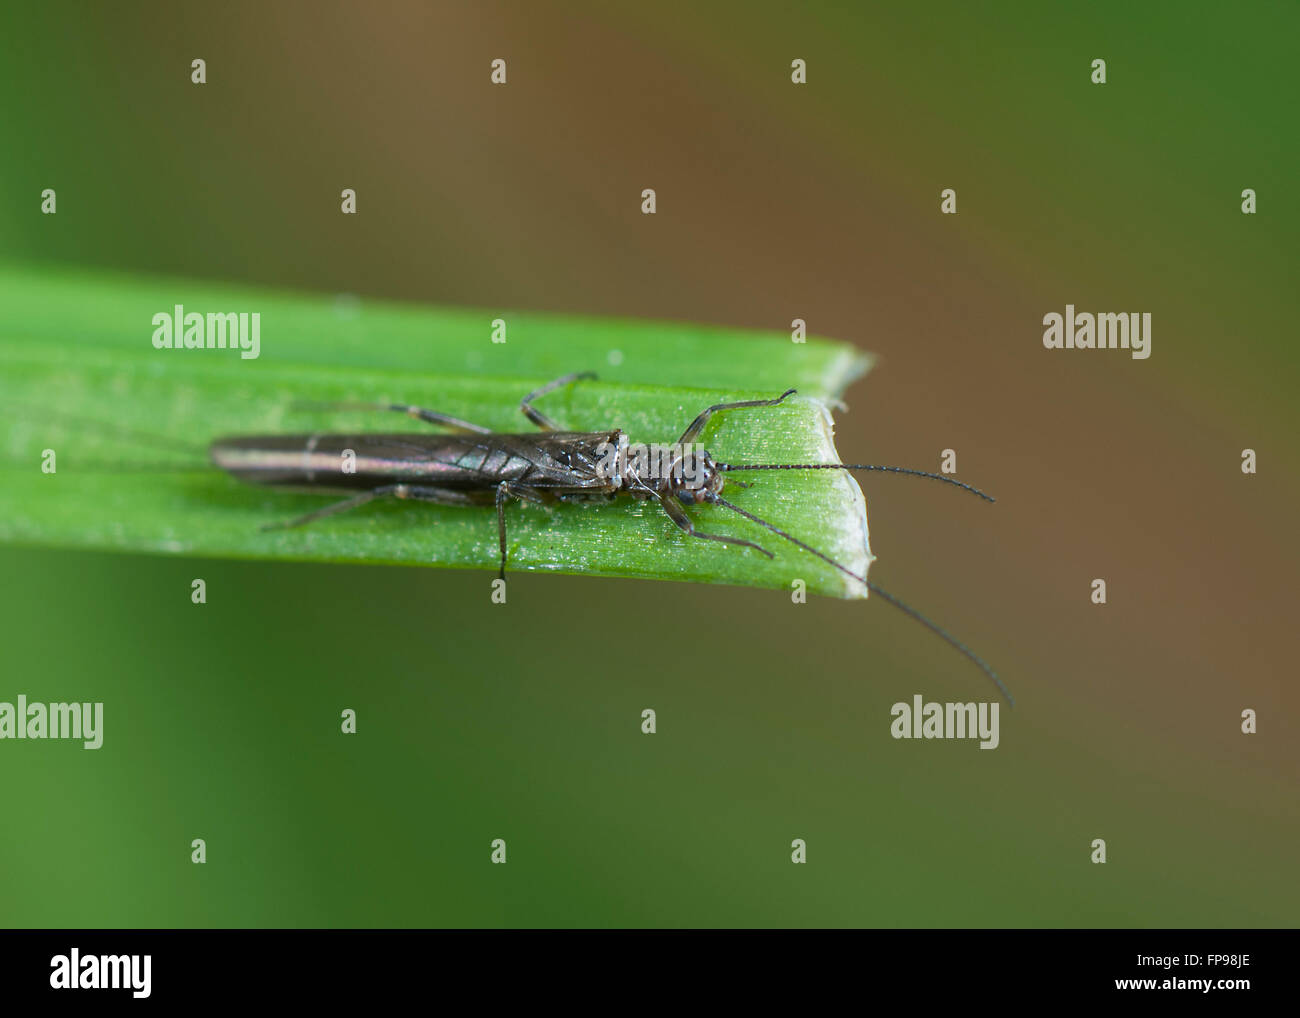 Stonefly (Plecoptera), Western Australia, Australia - Stock Image